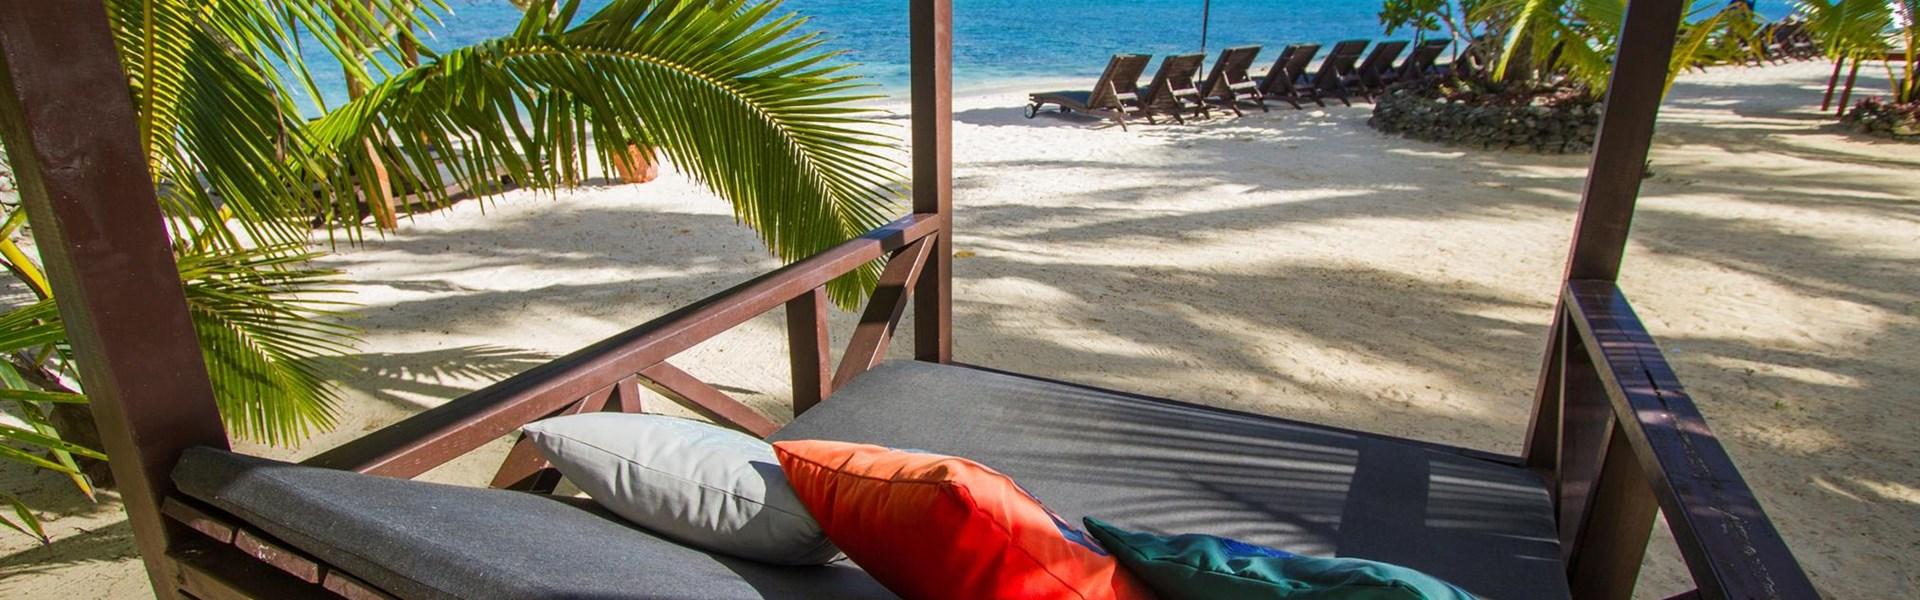 Marco Polo - Manuia Beach Resort -